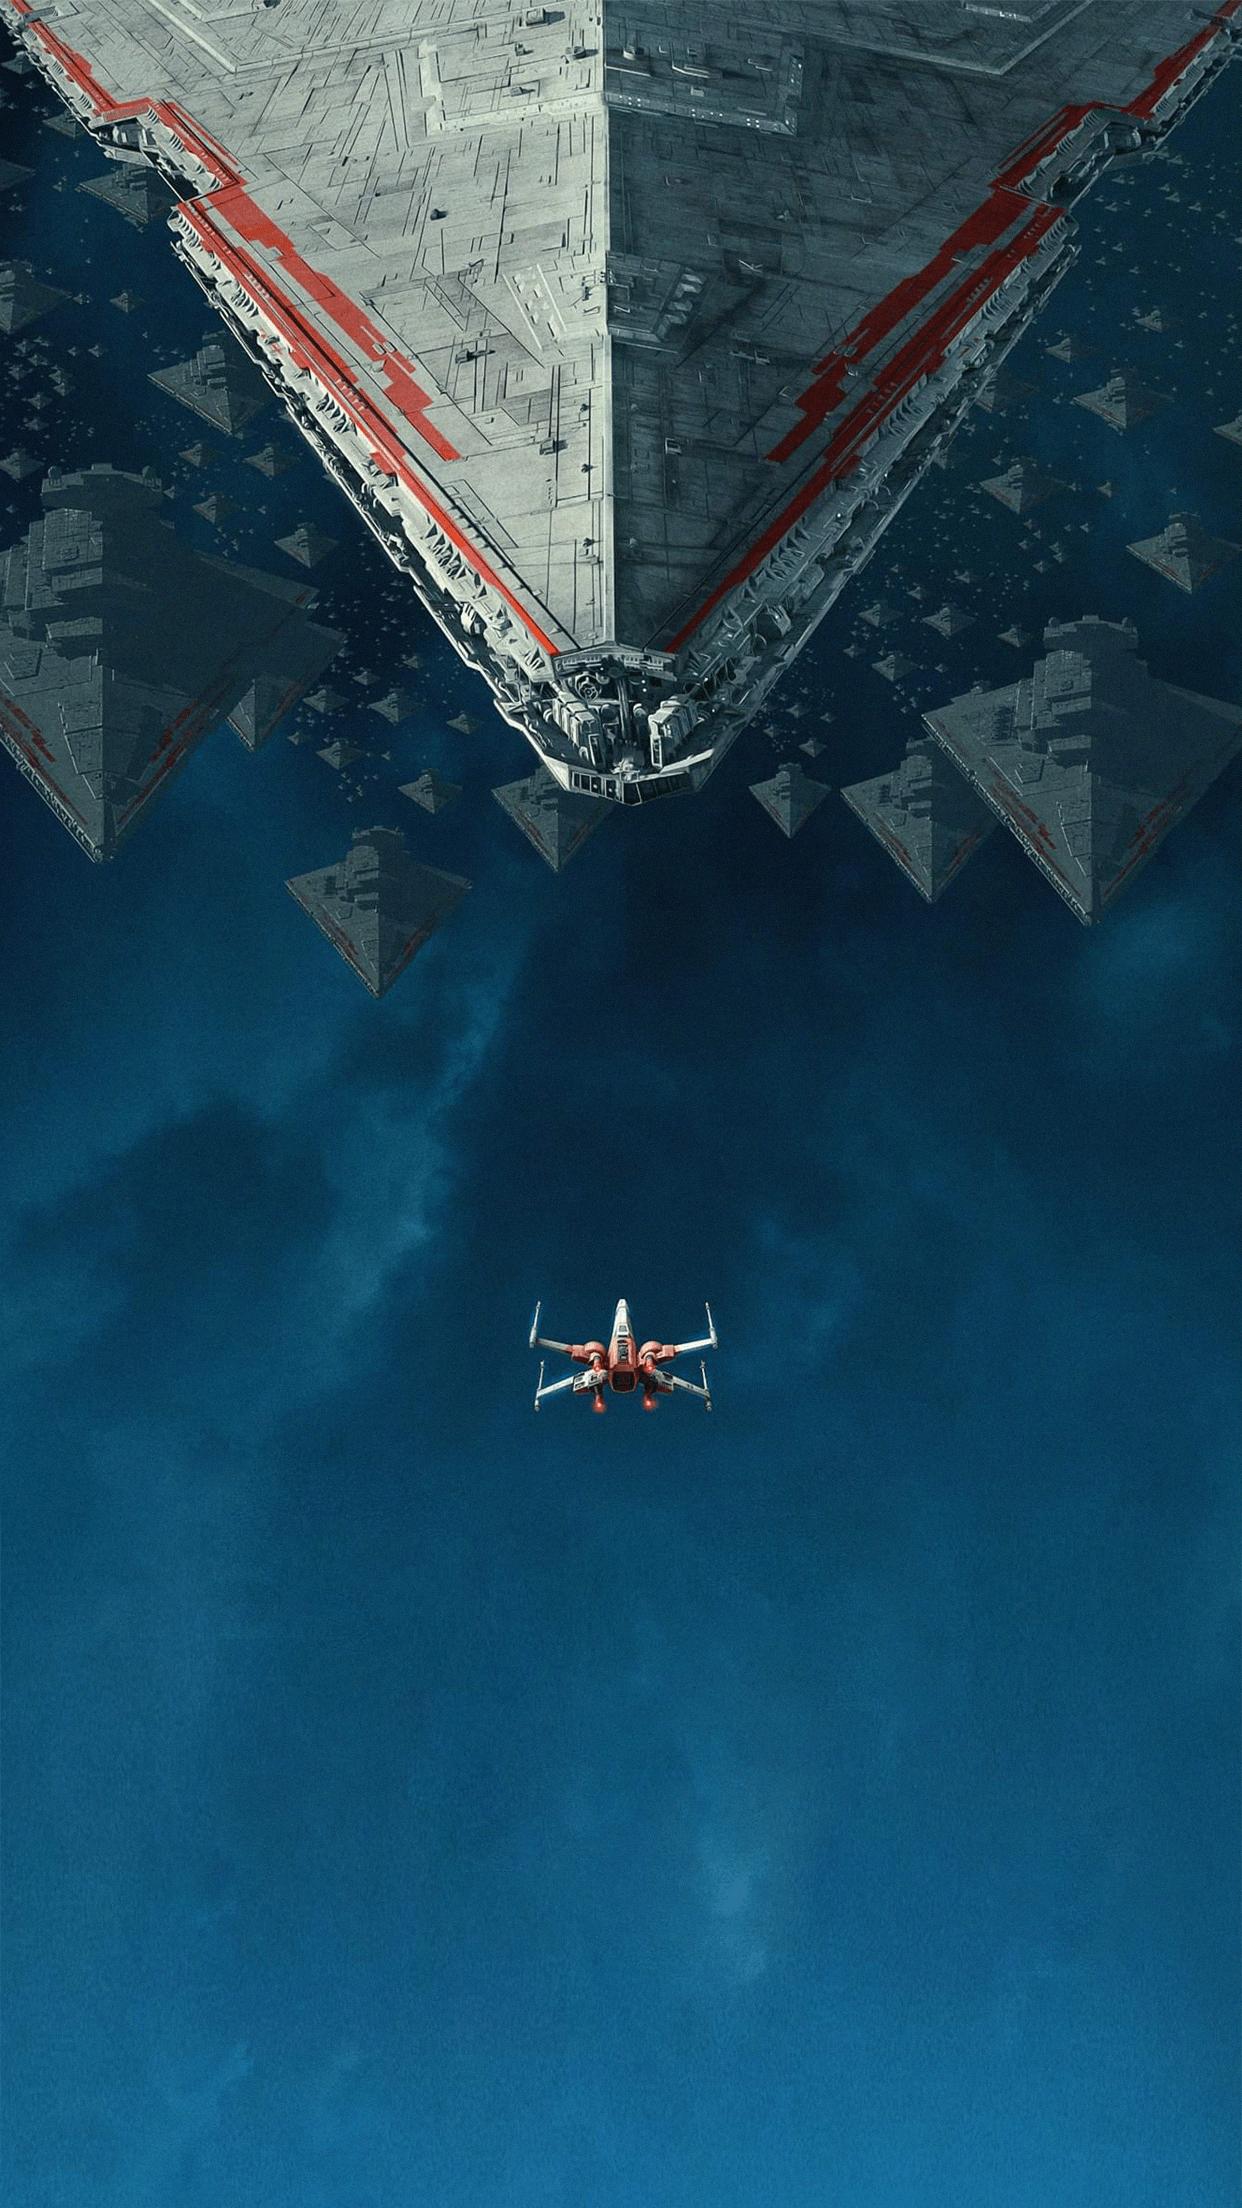 Star Wars HD Phone Wallpapers - Wallpaper Cave